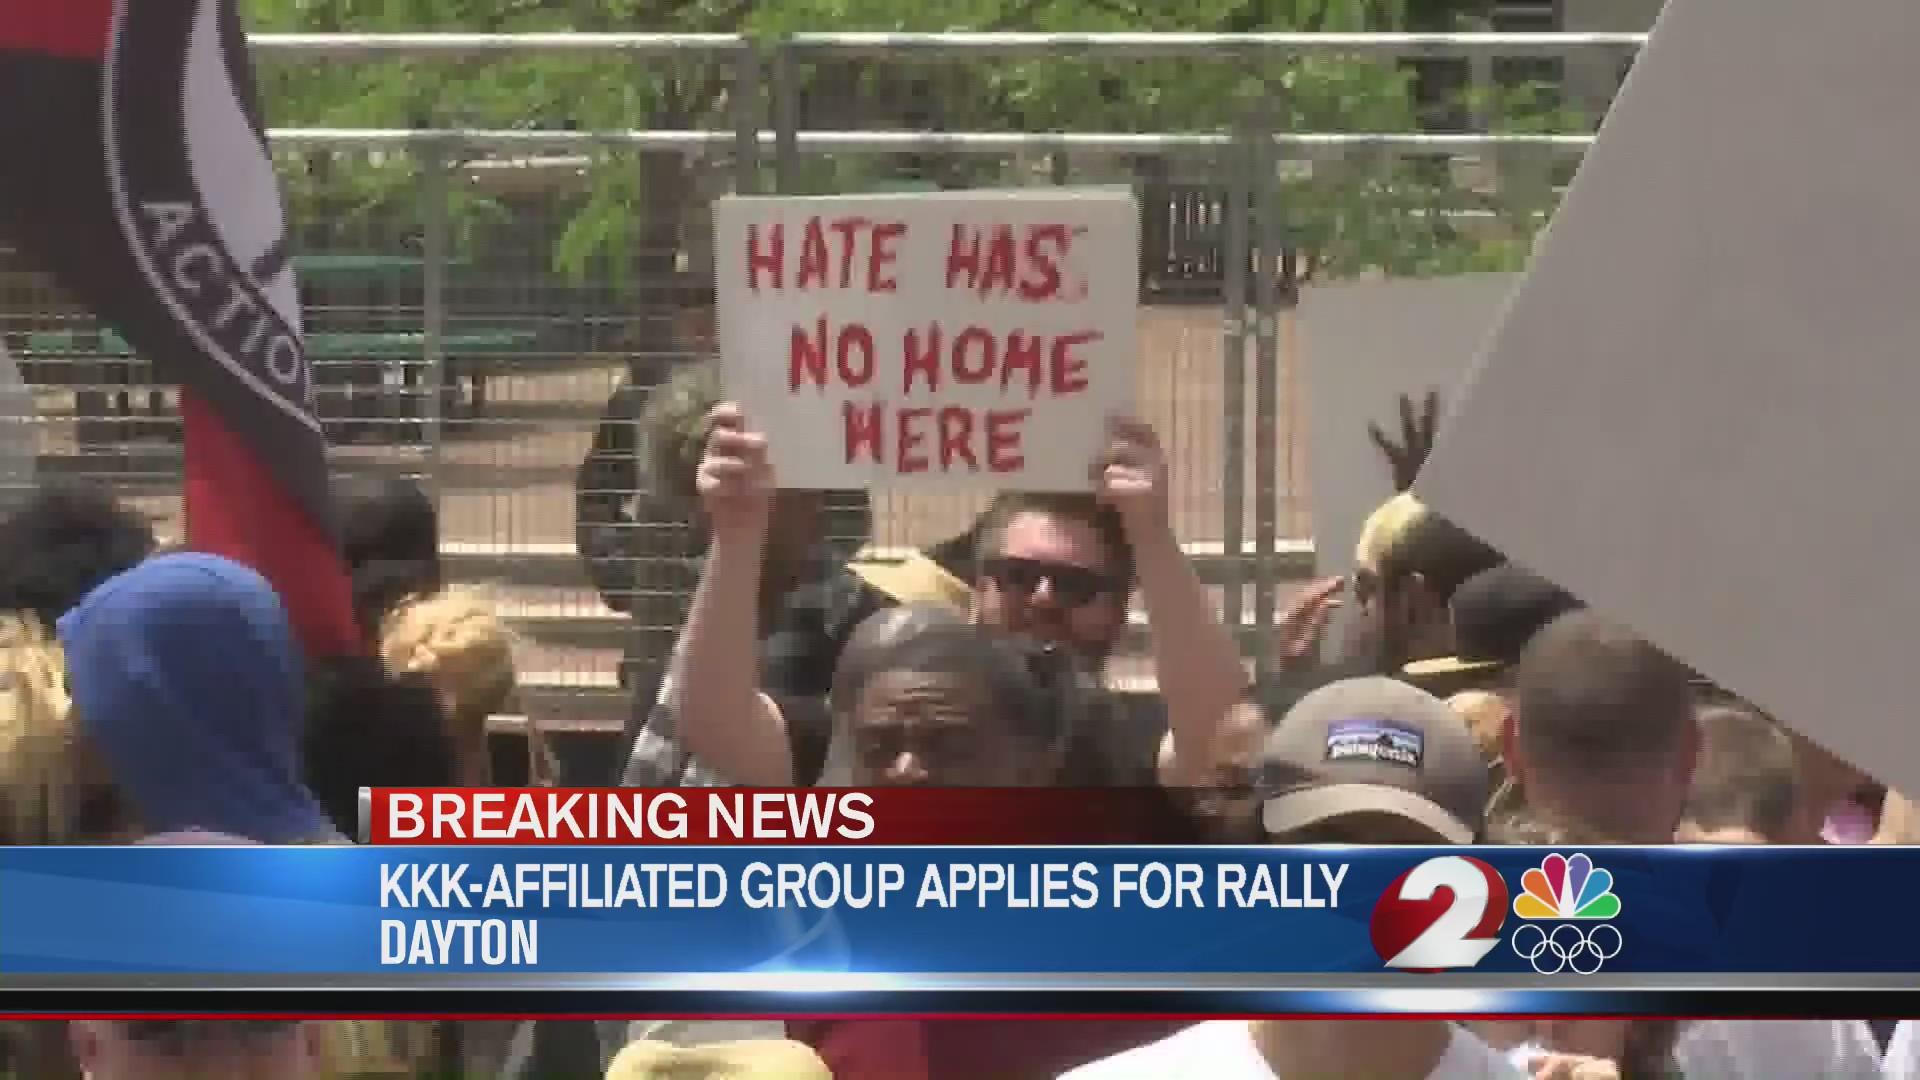 KKK-affiliated group applies for Sept. rally